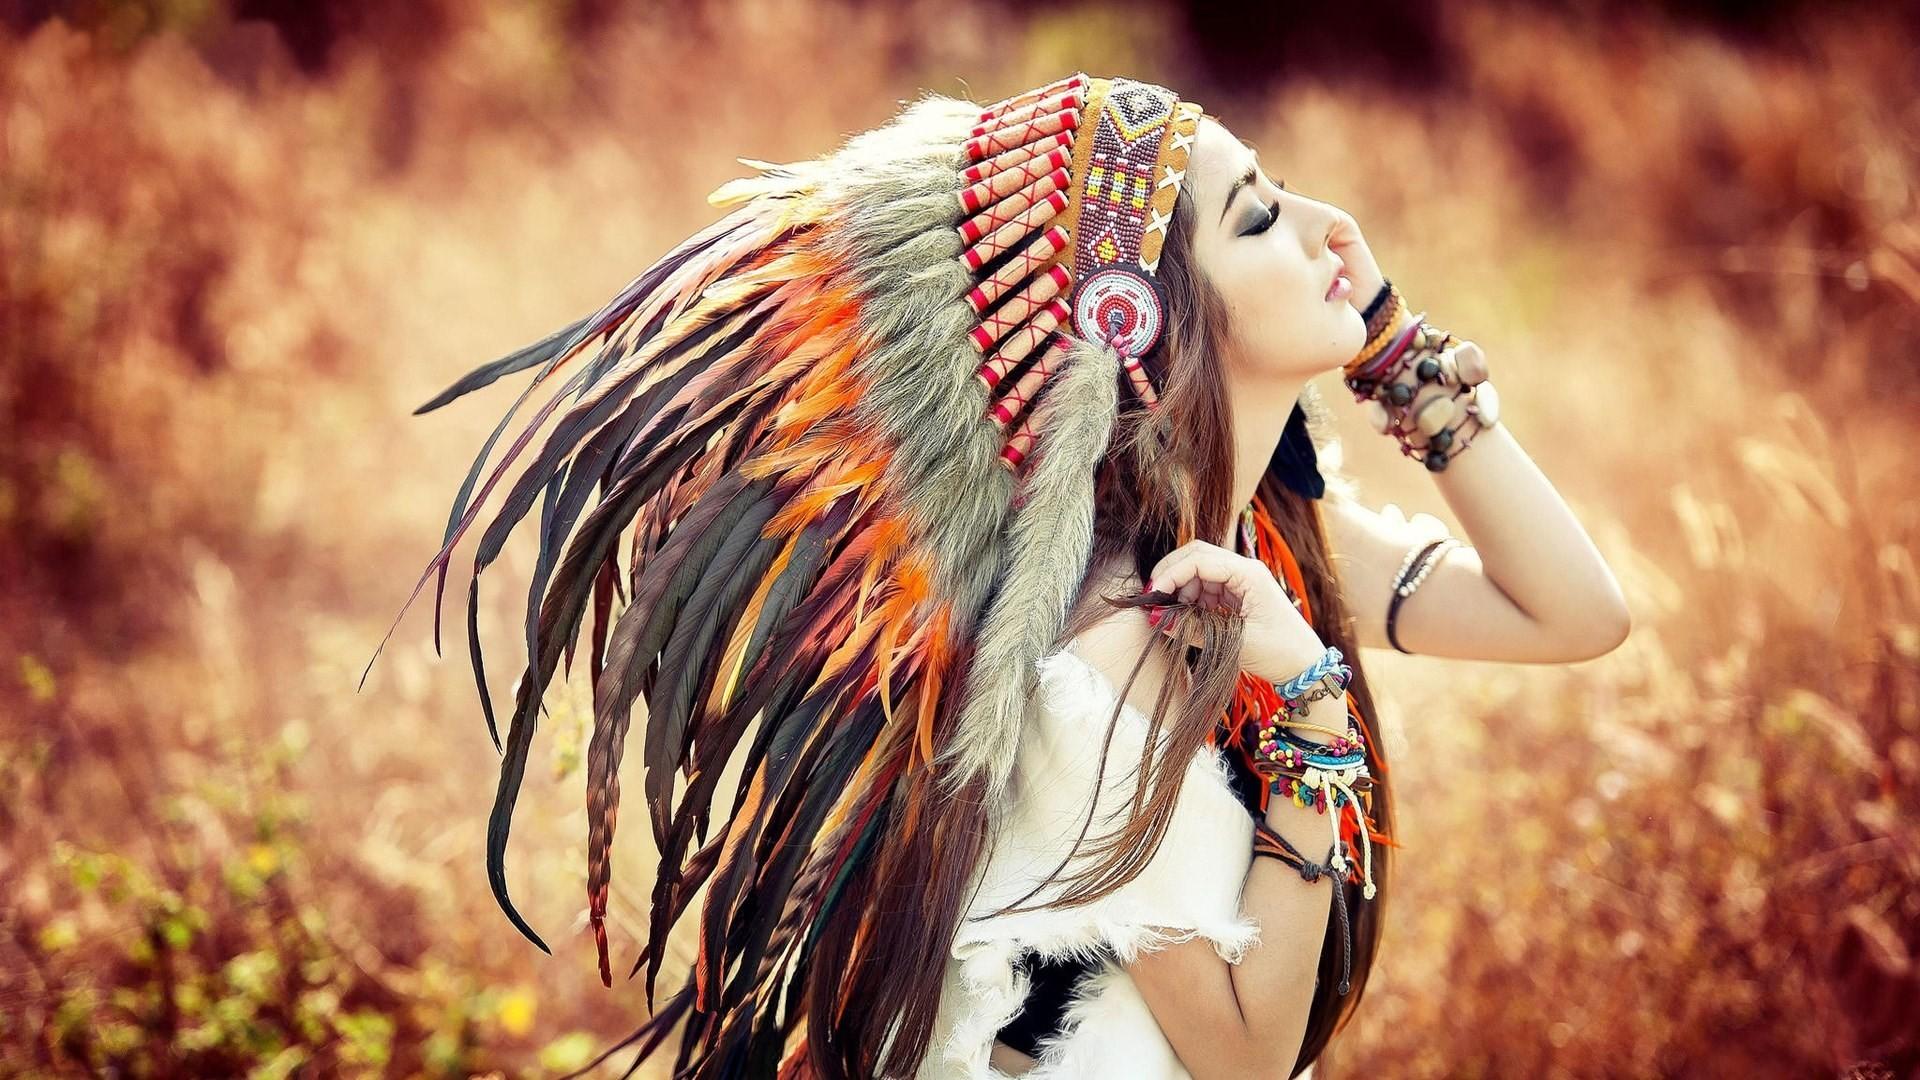 Native american images · 2017-03-27 – linh napie pic desktop nexus wallpaper,  #1412054